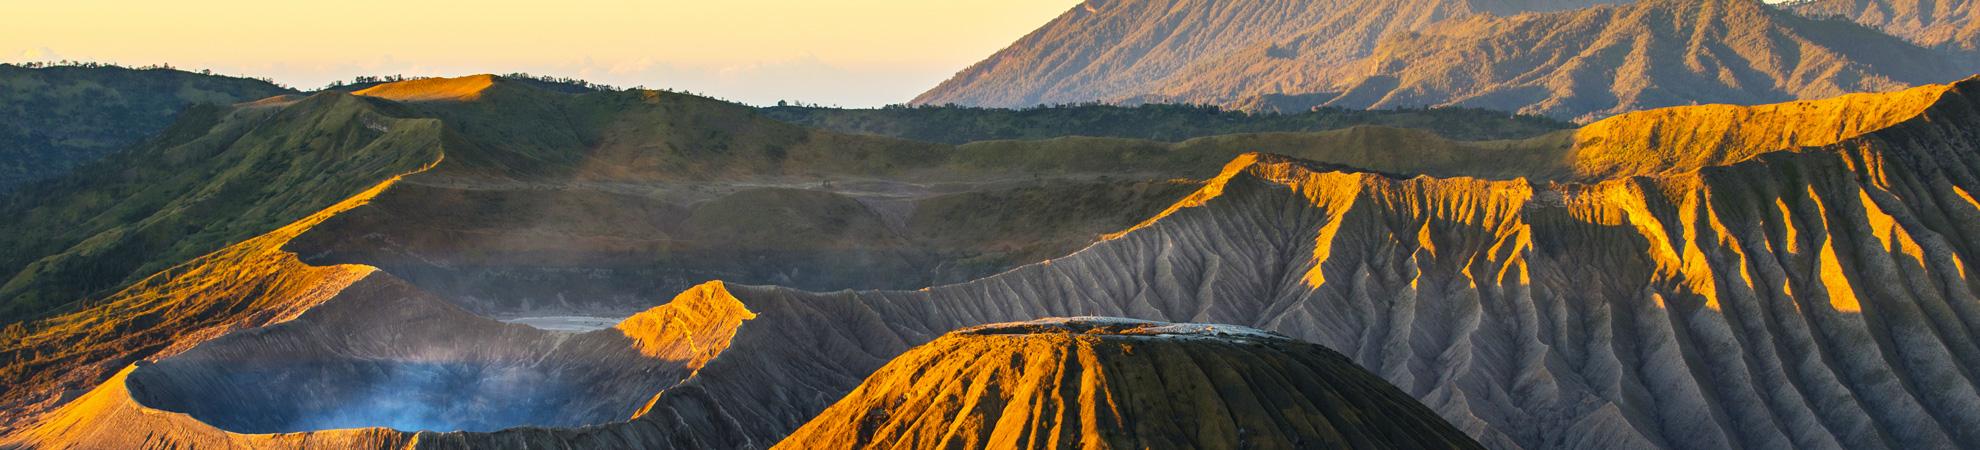 Risque naturel en Indonésie